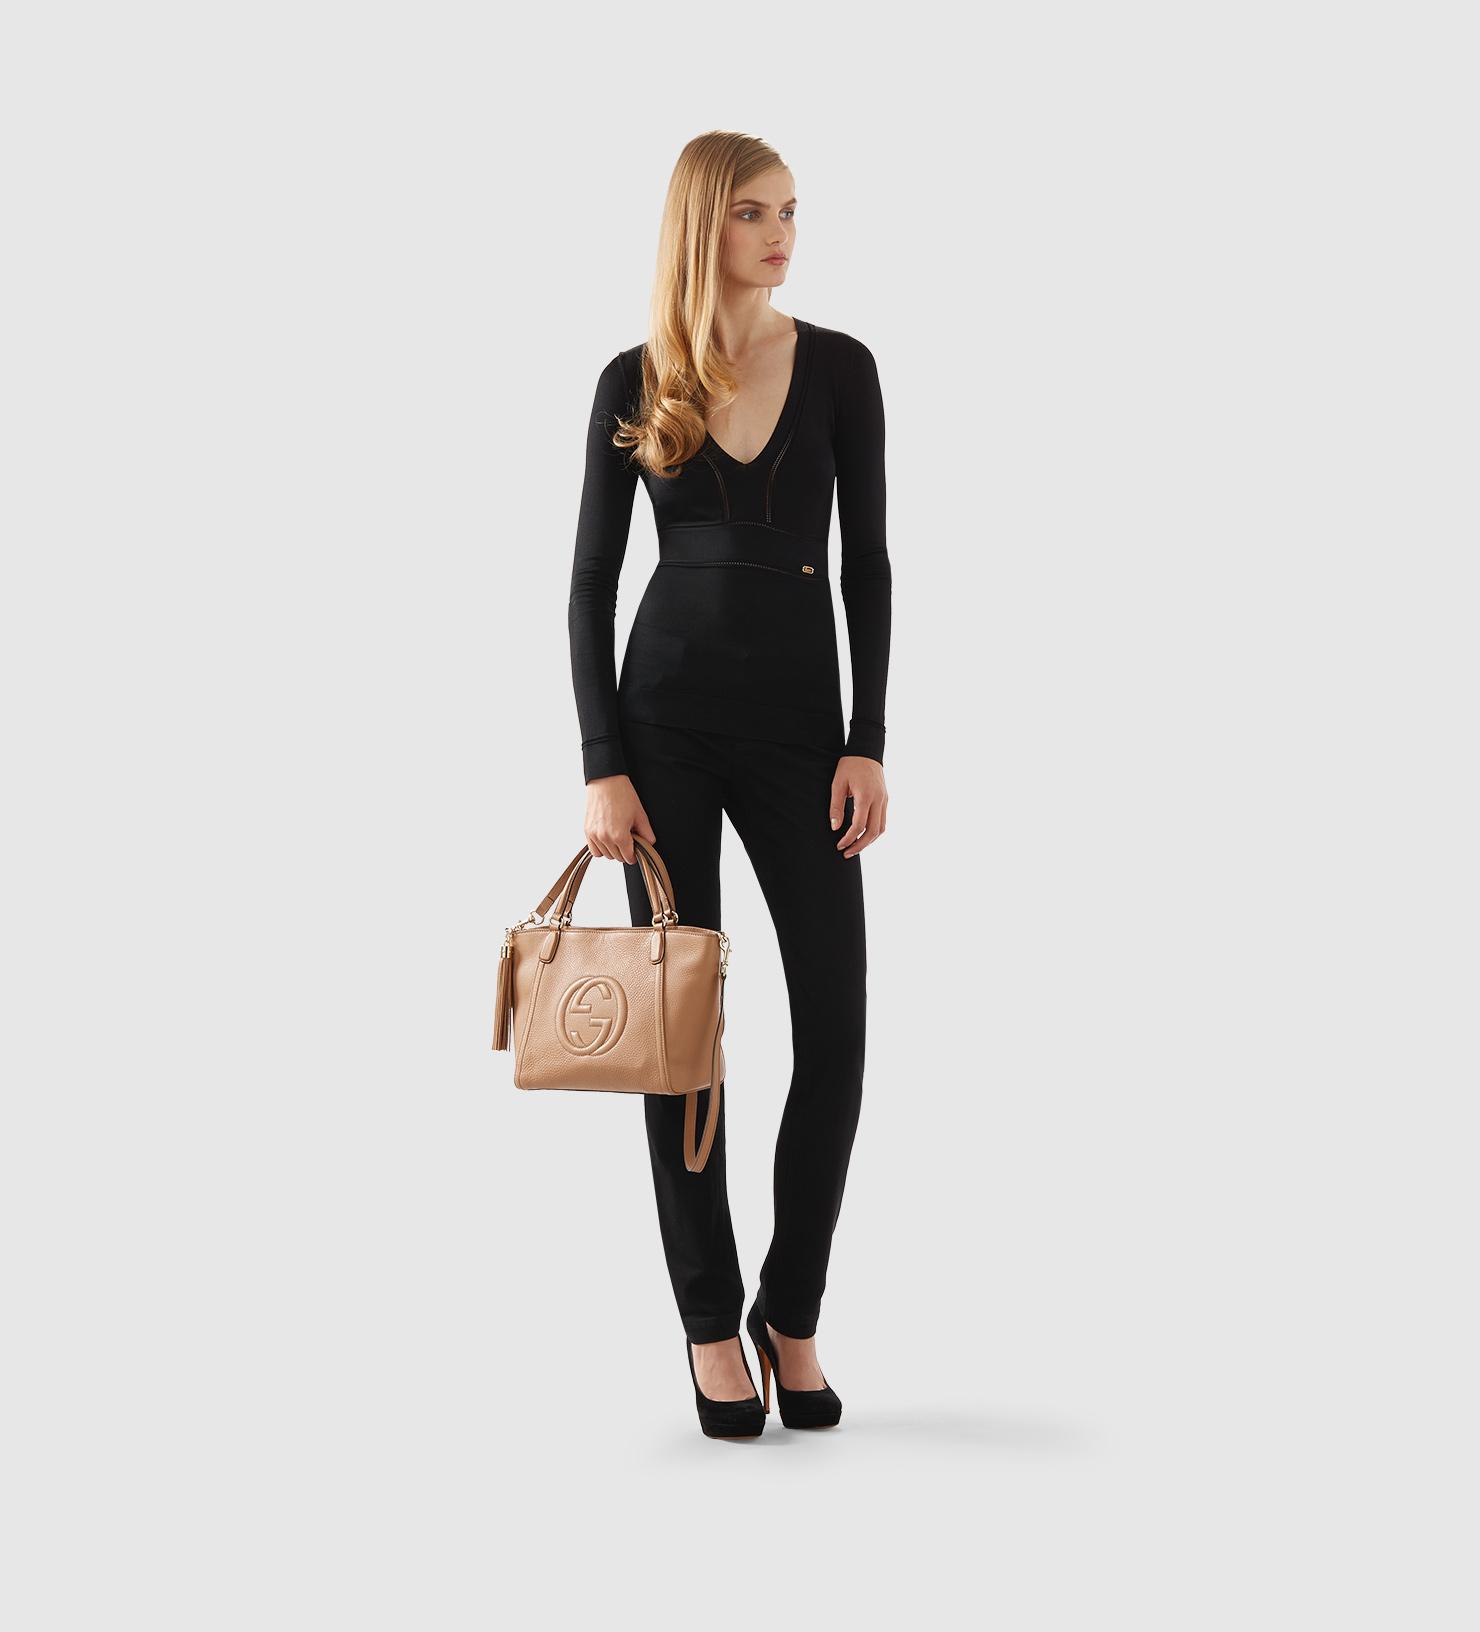 Leather top handle handbag